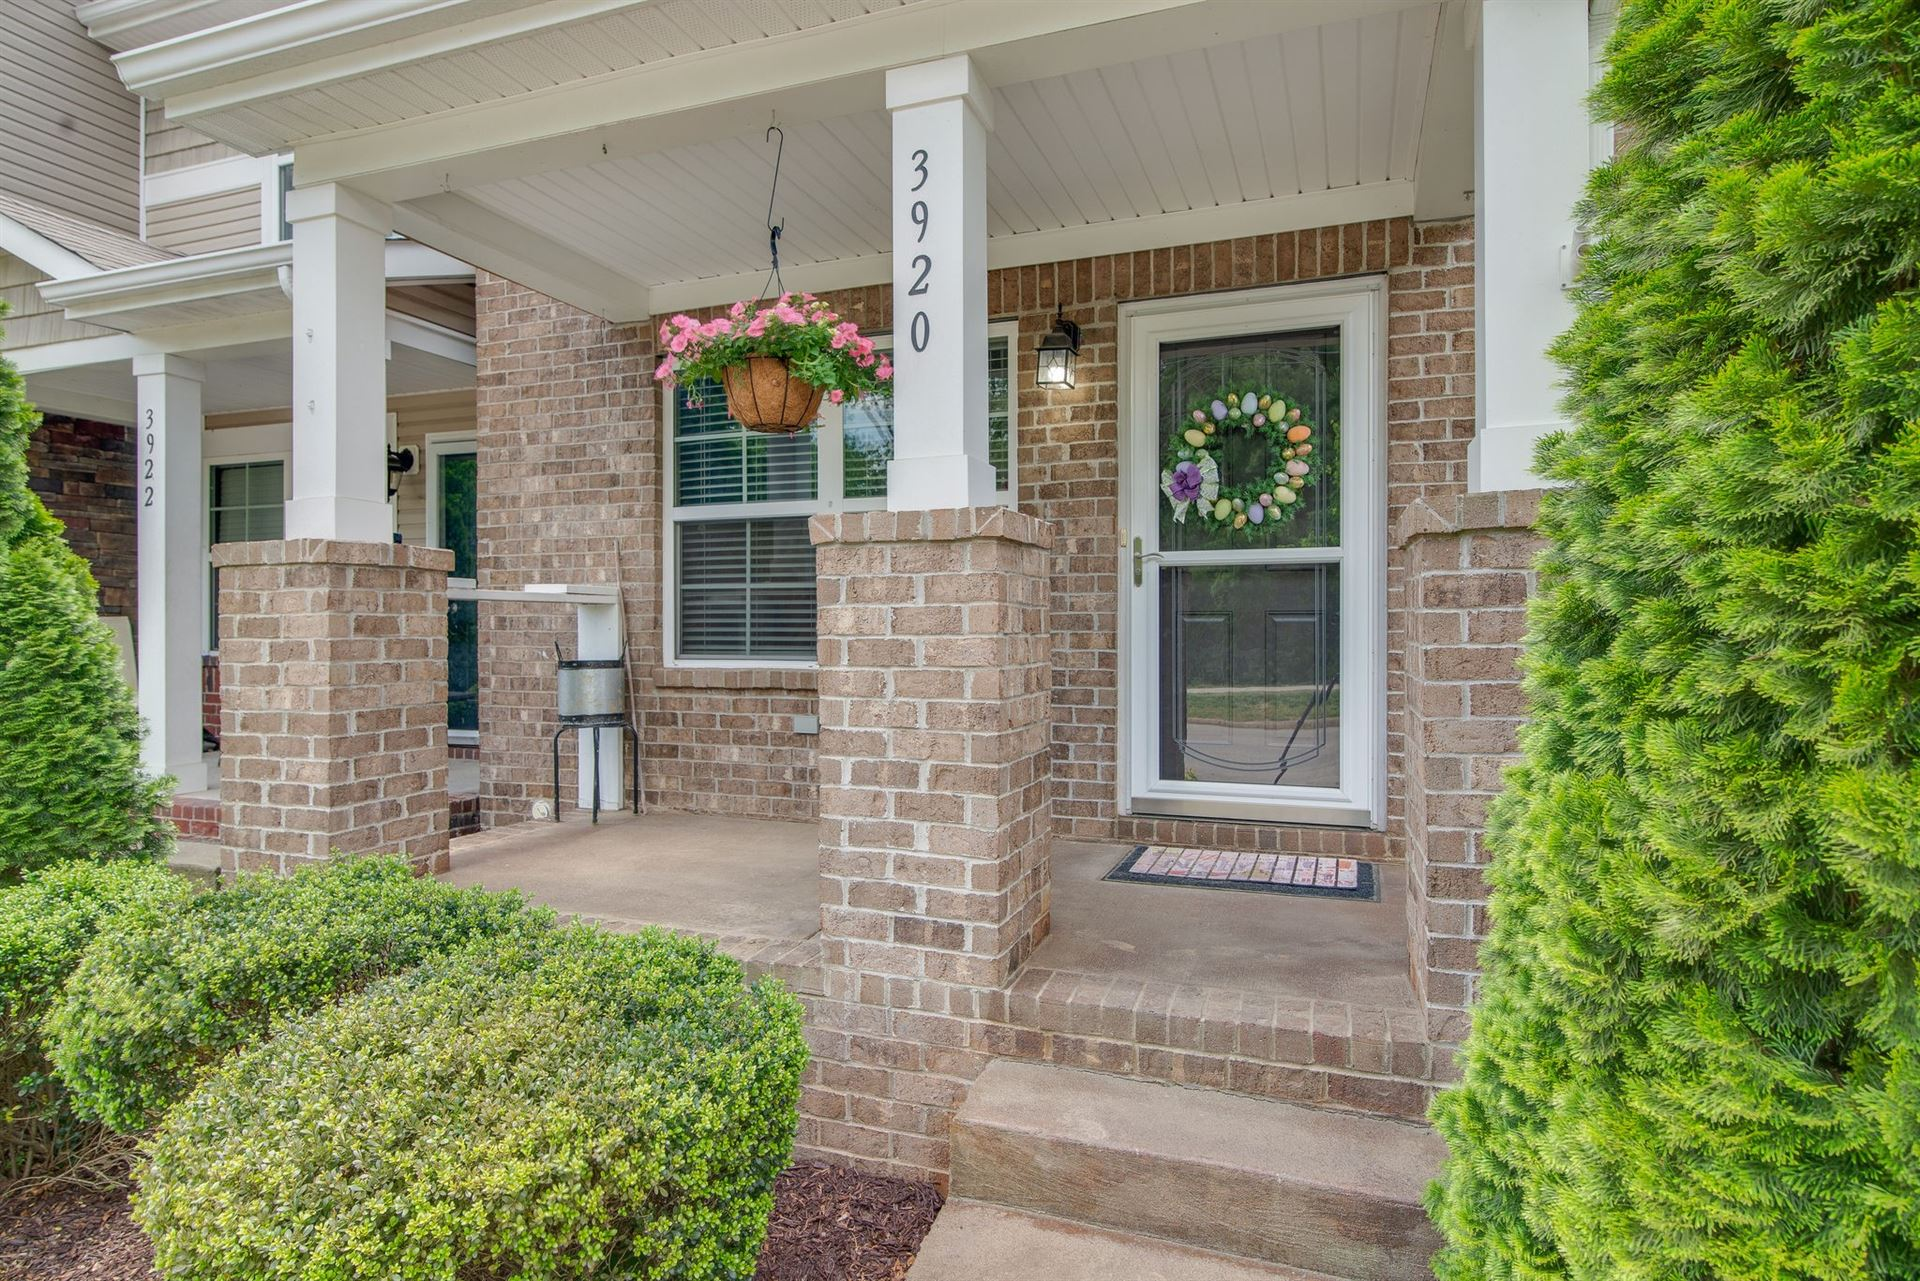 Photo of 3920 Hoggett Ford Rd, Hermitage, TN 37076 (MLS # 2185056)